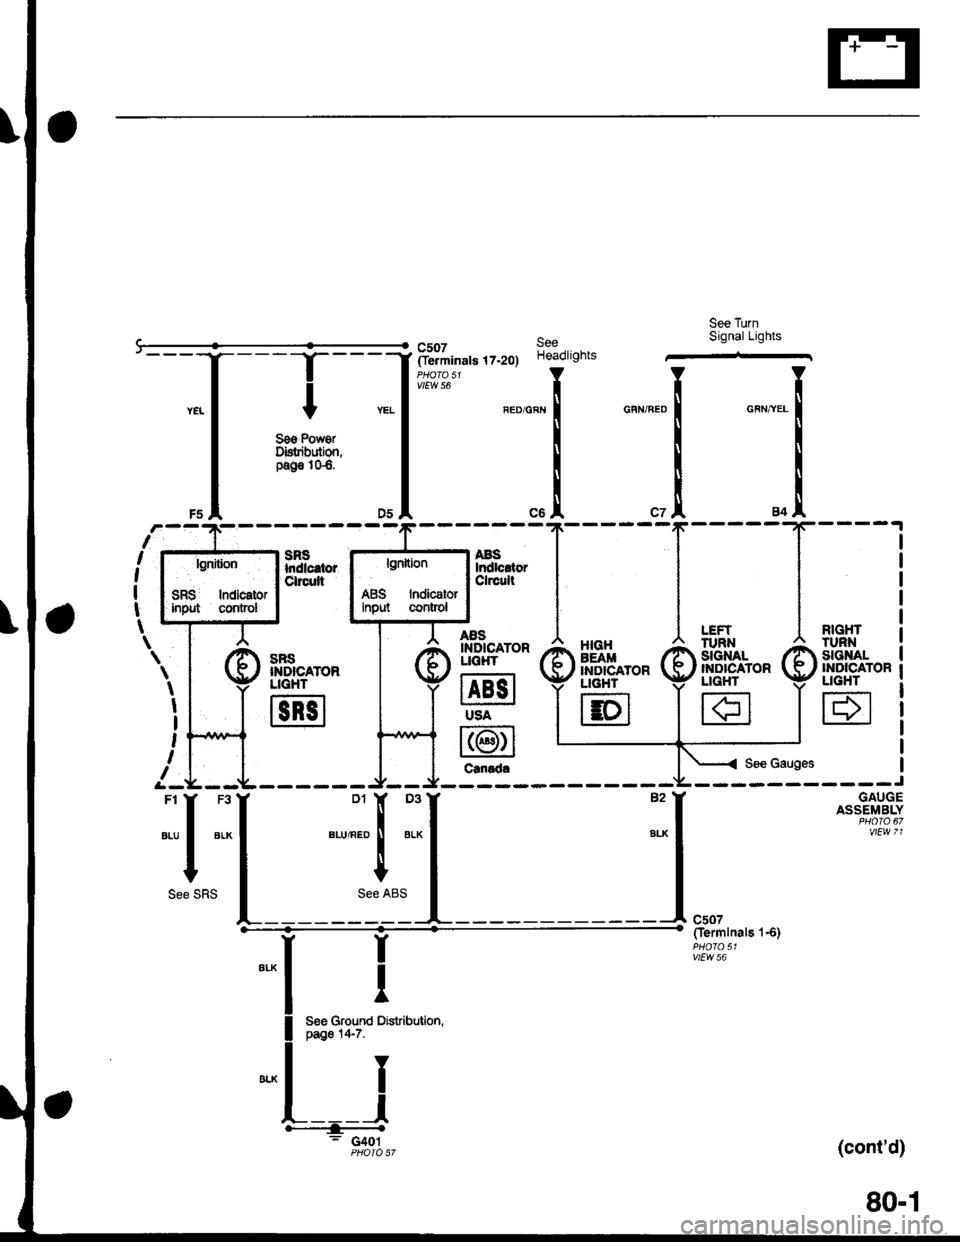 1995 Volvo 960 Wiring Diagram 2005 Volvo Xc90 Wiring